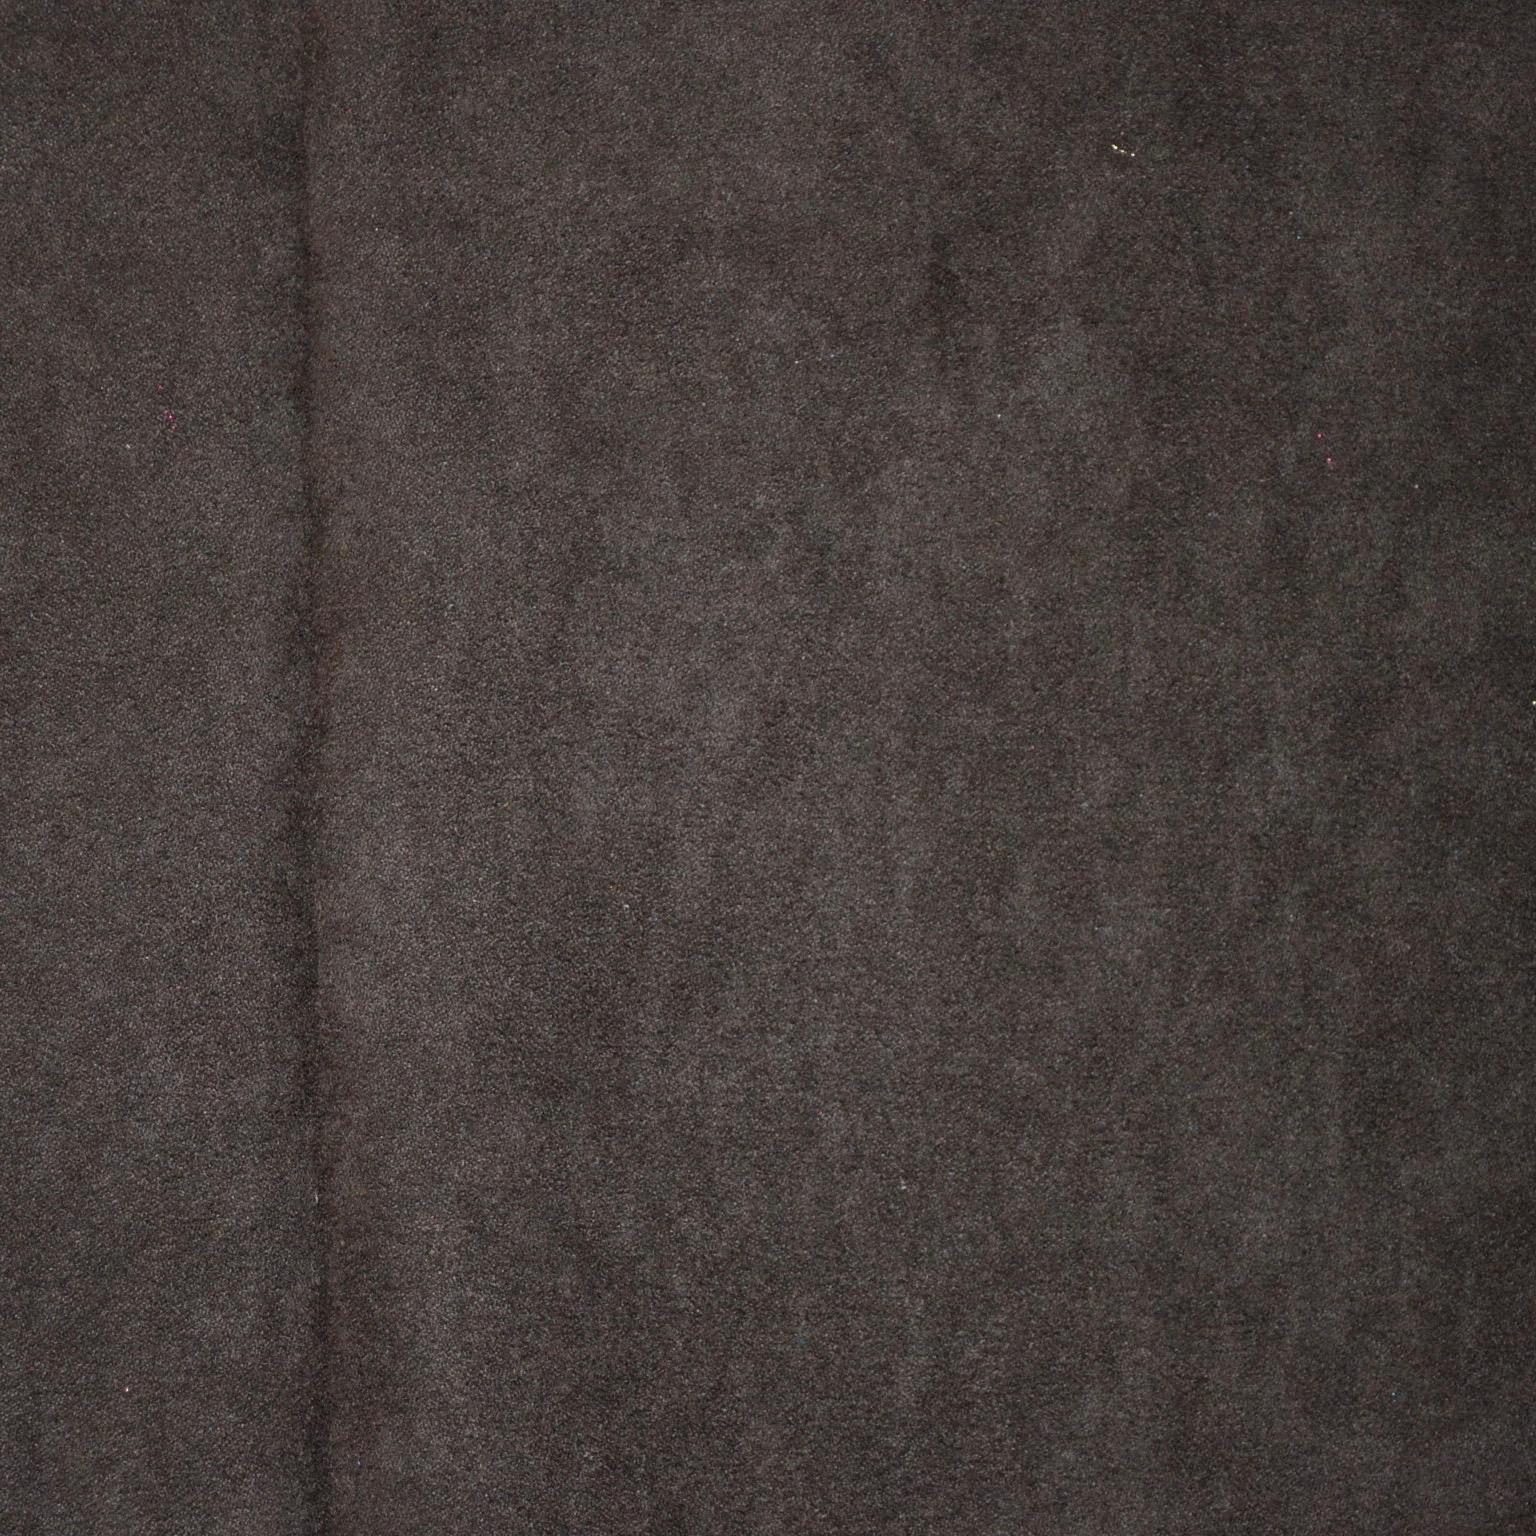 brown faux suede